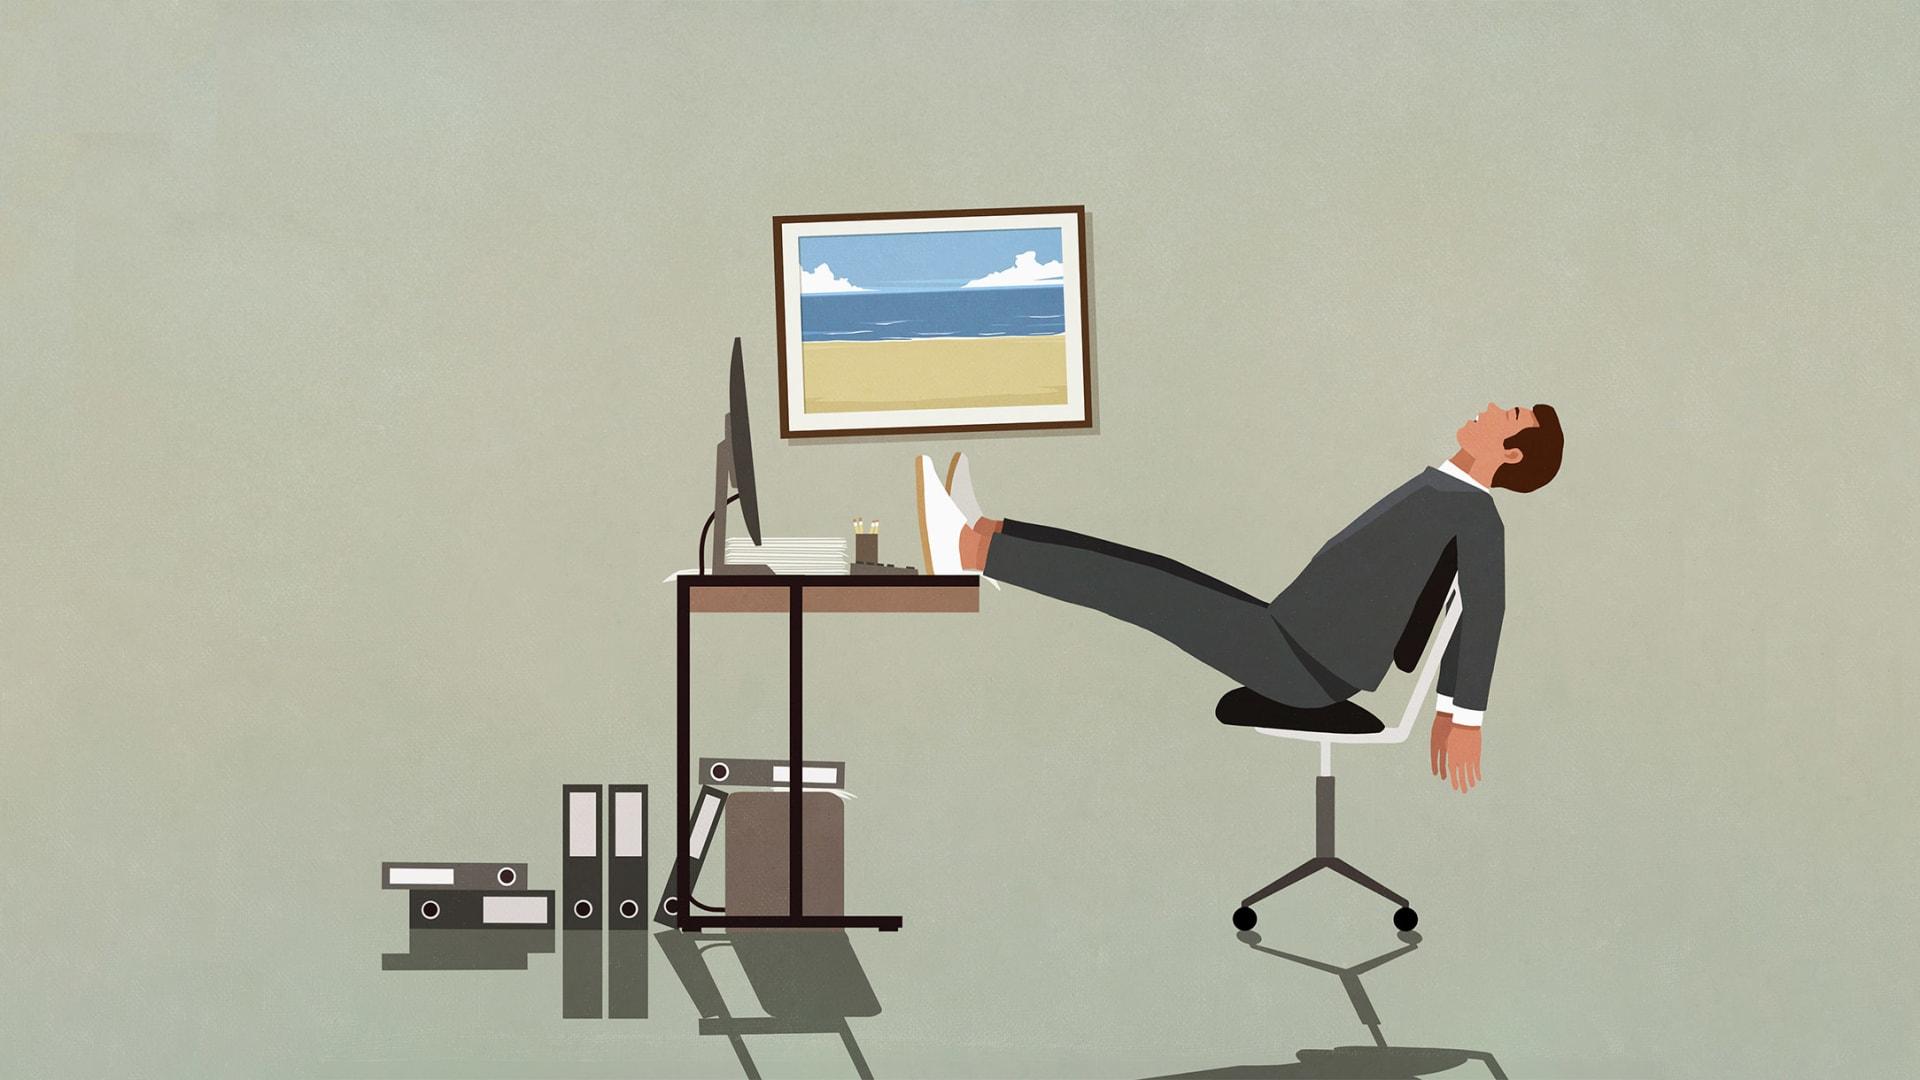 10 Tips to Address Employee Disengagement Through Conscious Capitalism